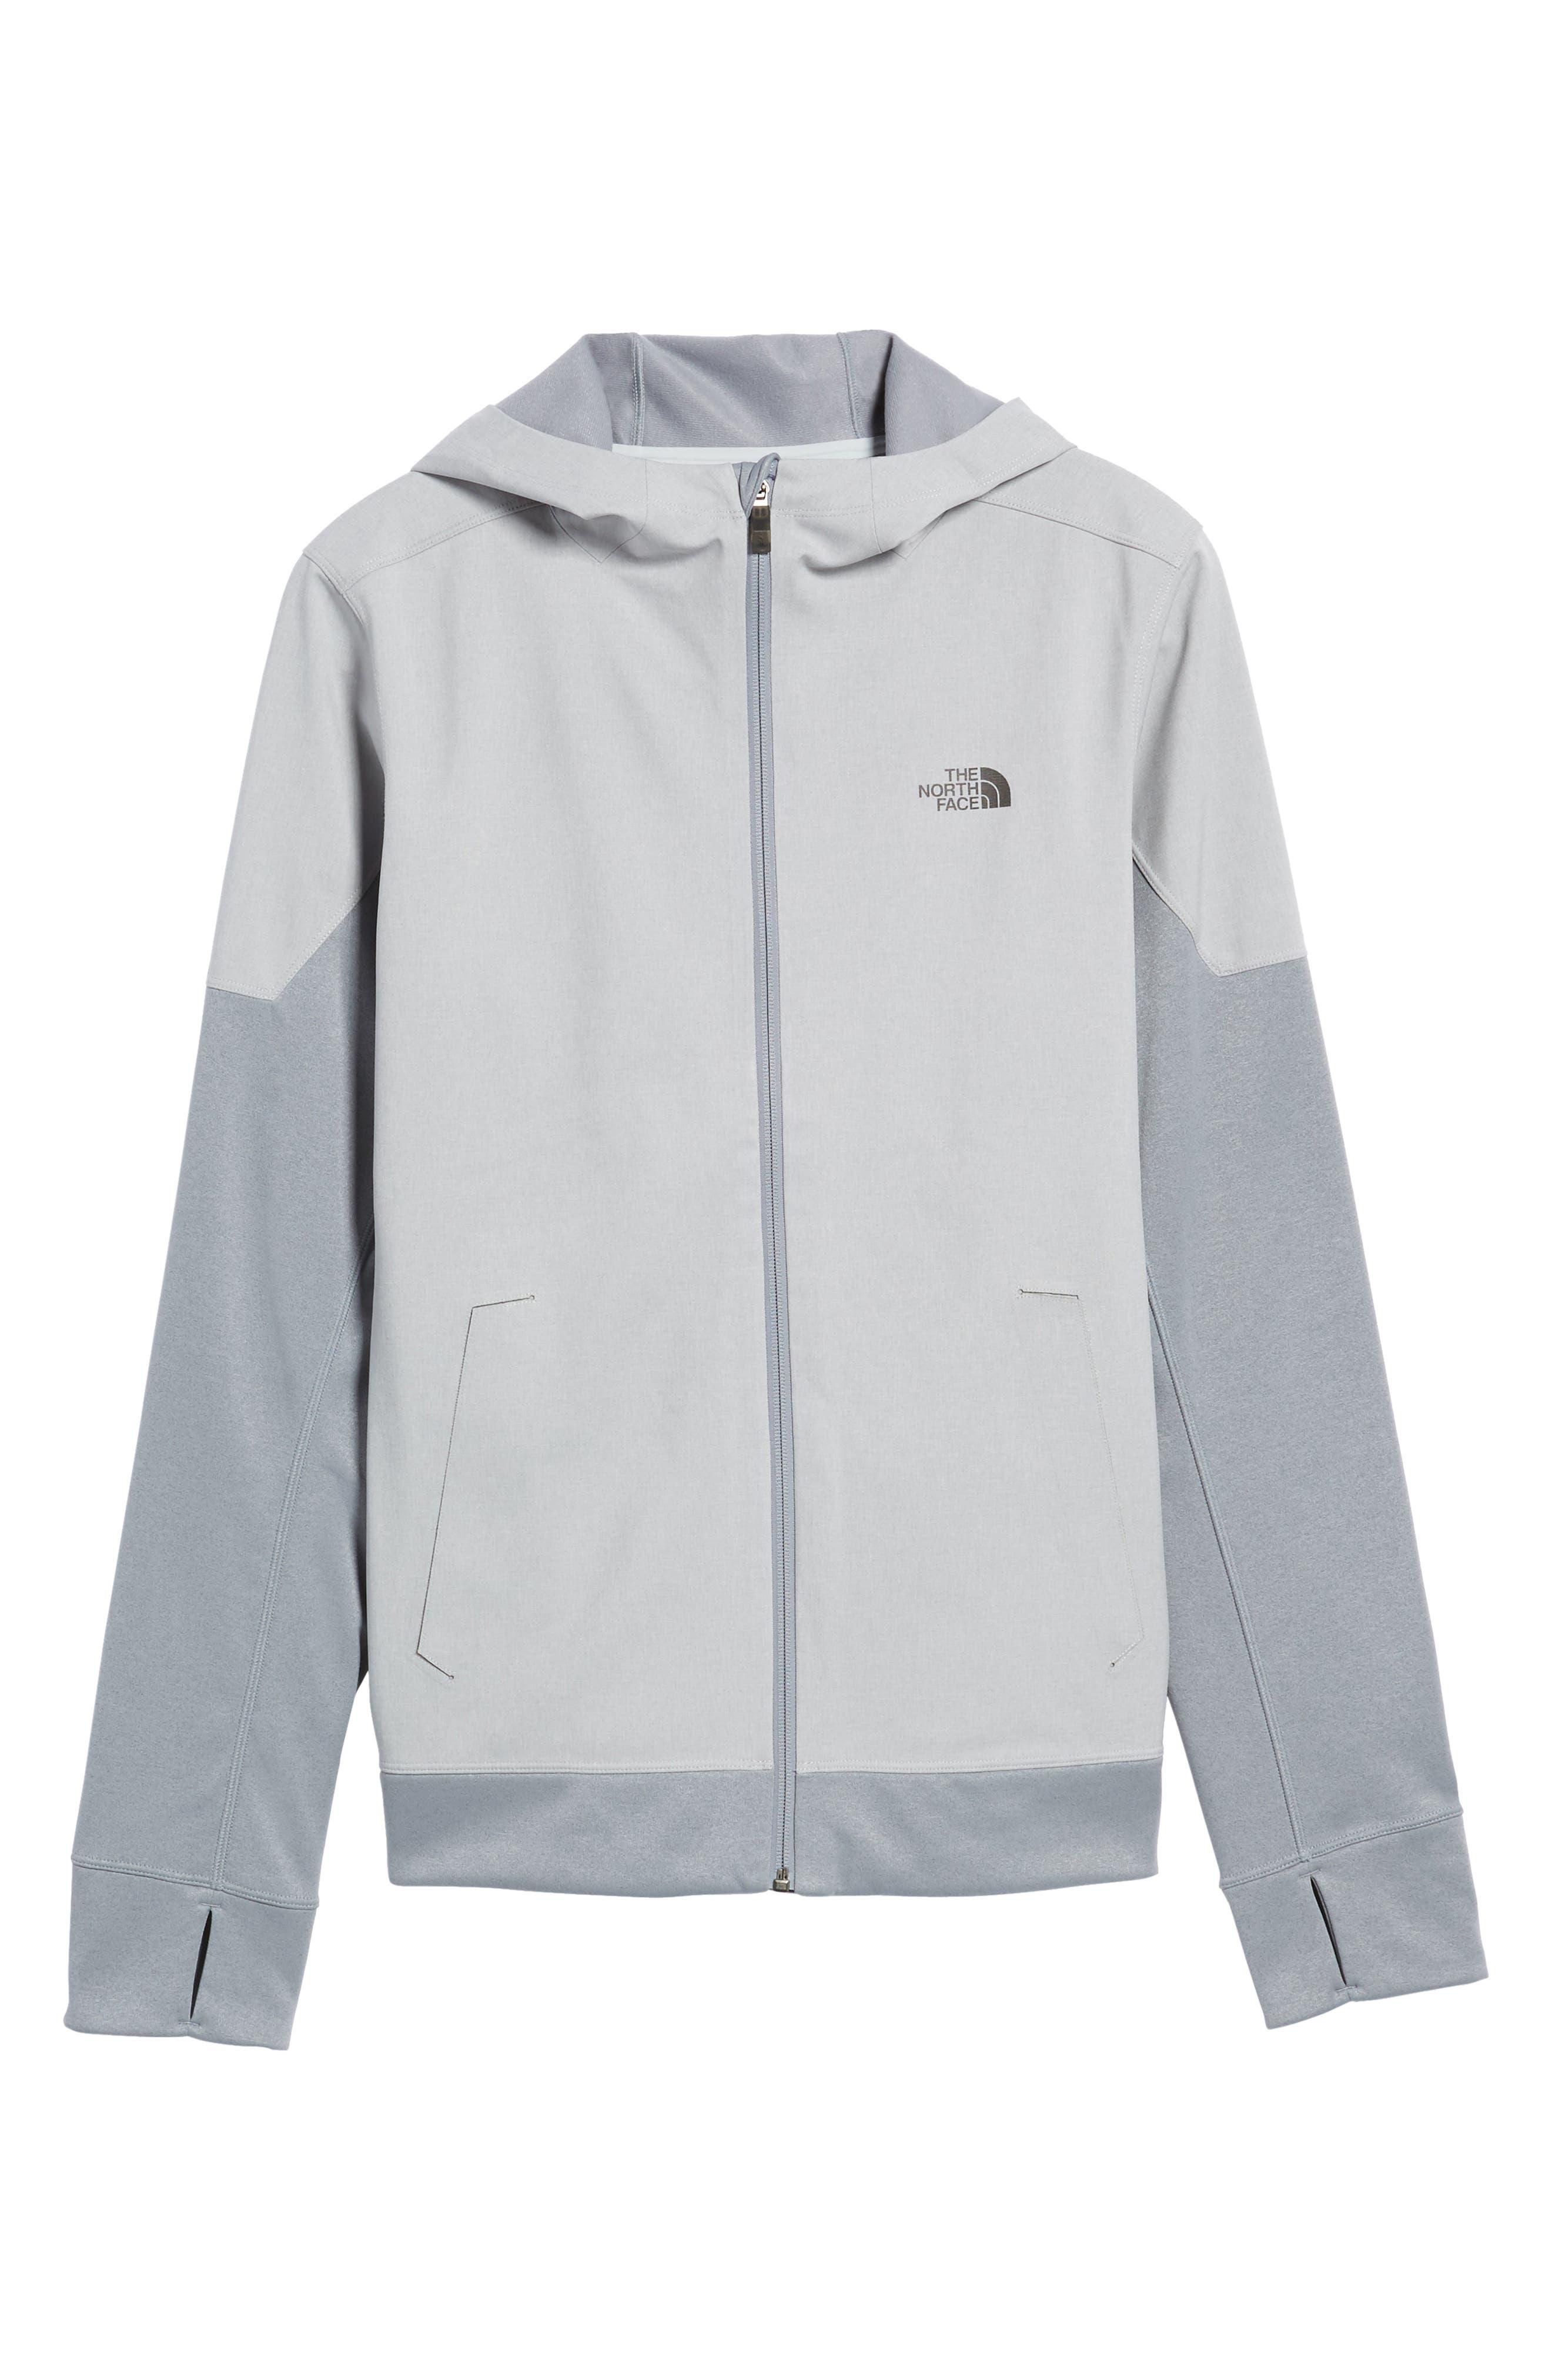 'Kilowatt' Hooded Jacket,                         Main,                         color, Tnf Light Grey Heather